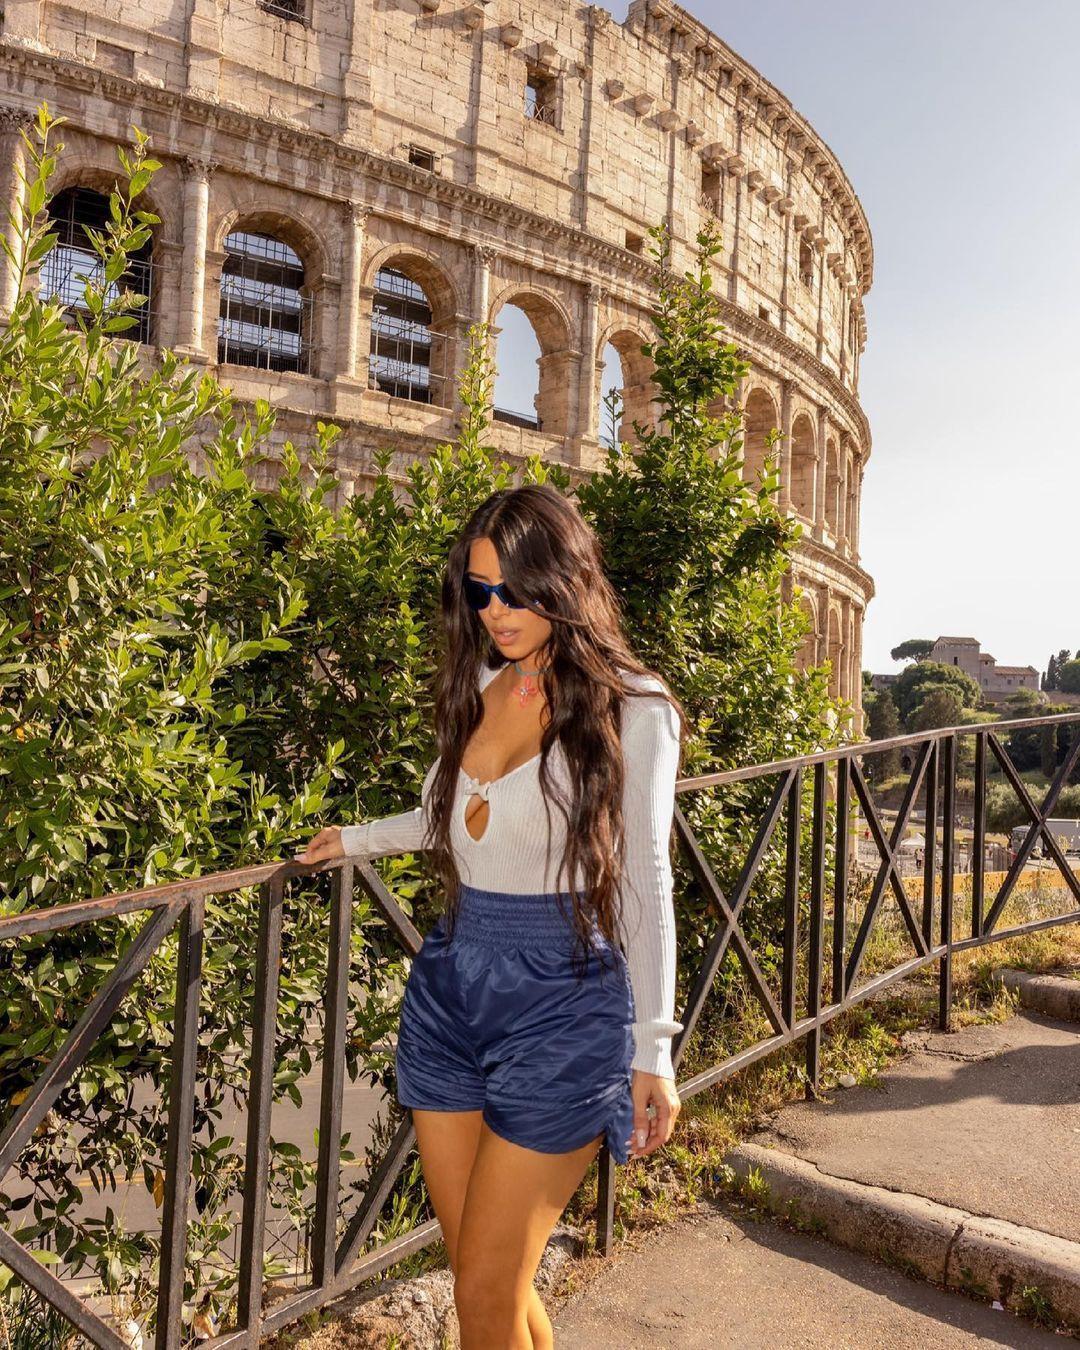 Roma'da olan Kim Kardashian'dan üstsüz yatak pozu - Sayfa 2